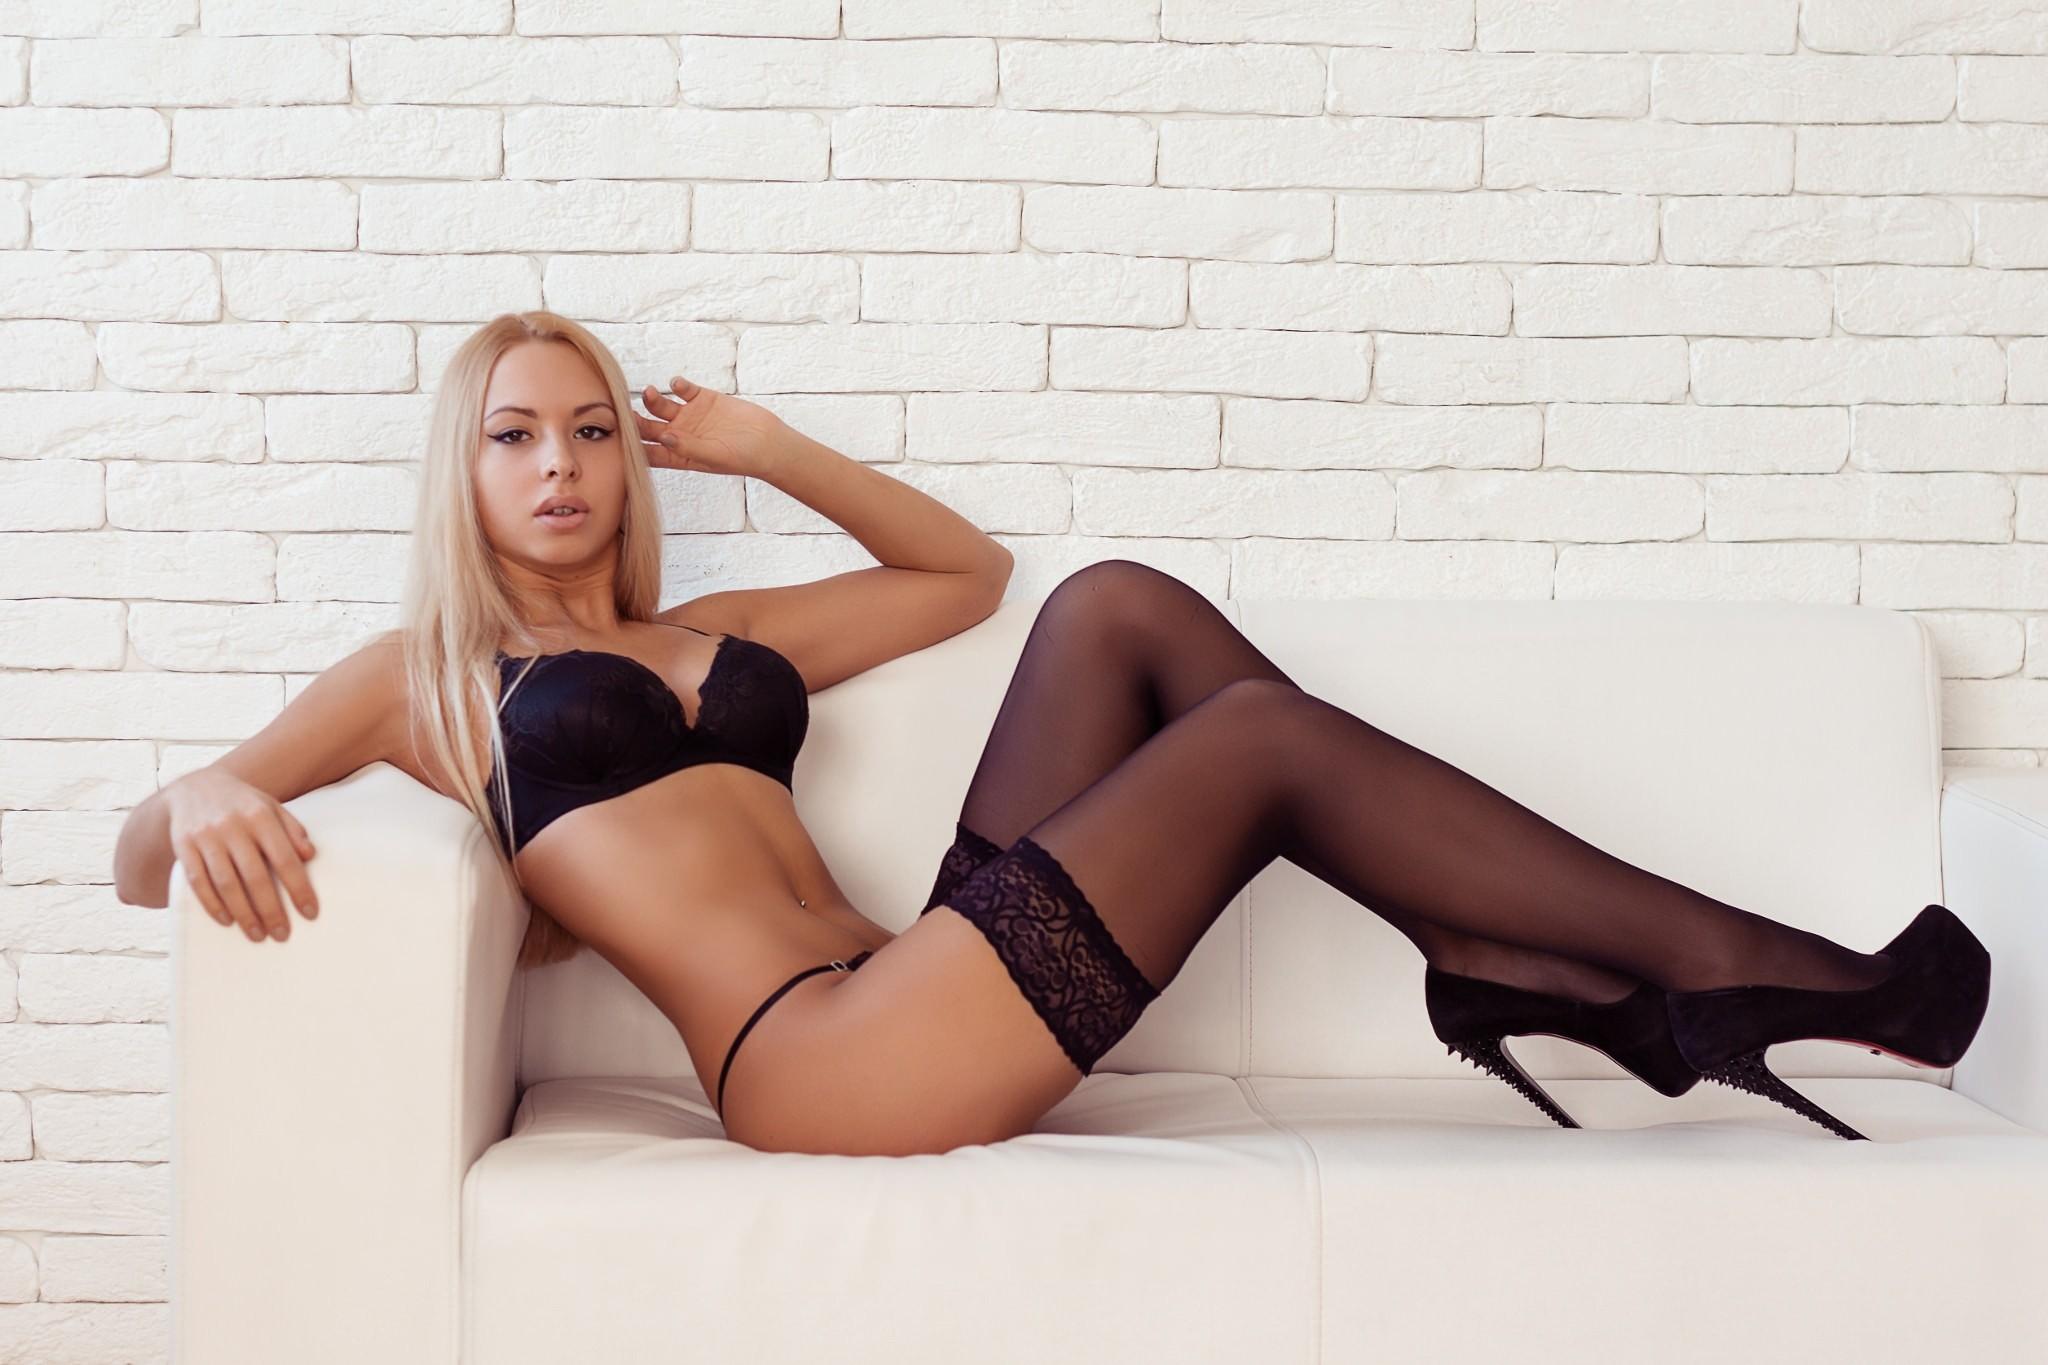 Walls Pierced Navel High Heels Blonde Sitting Curvy